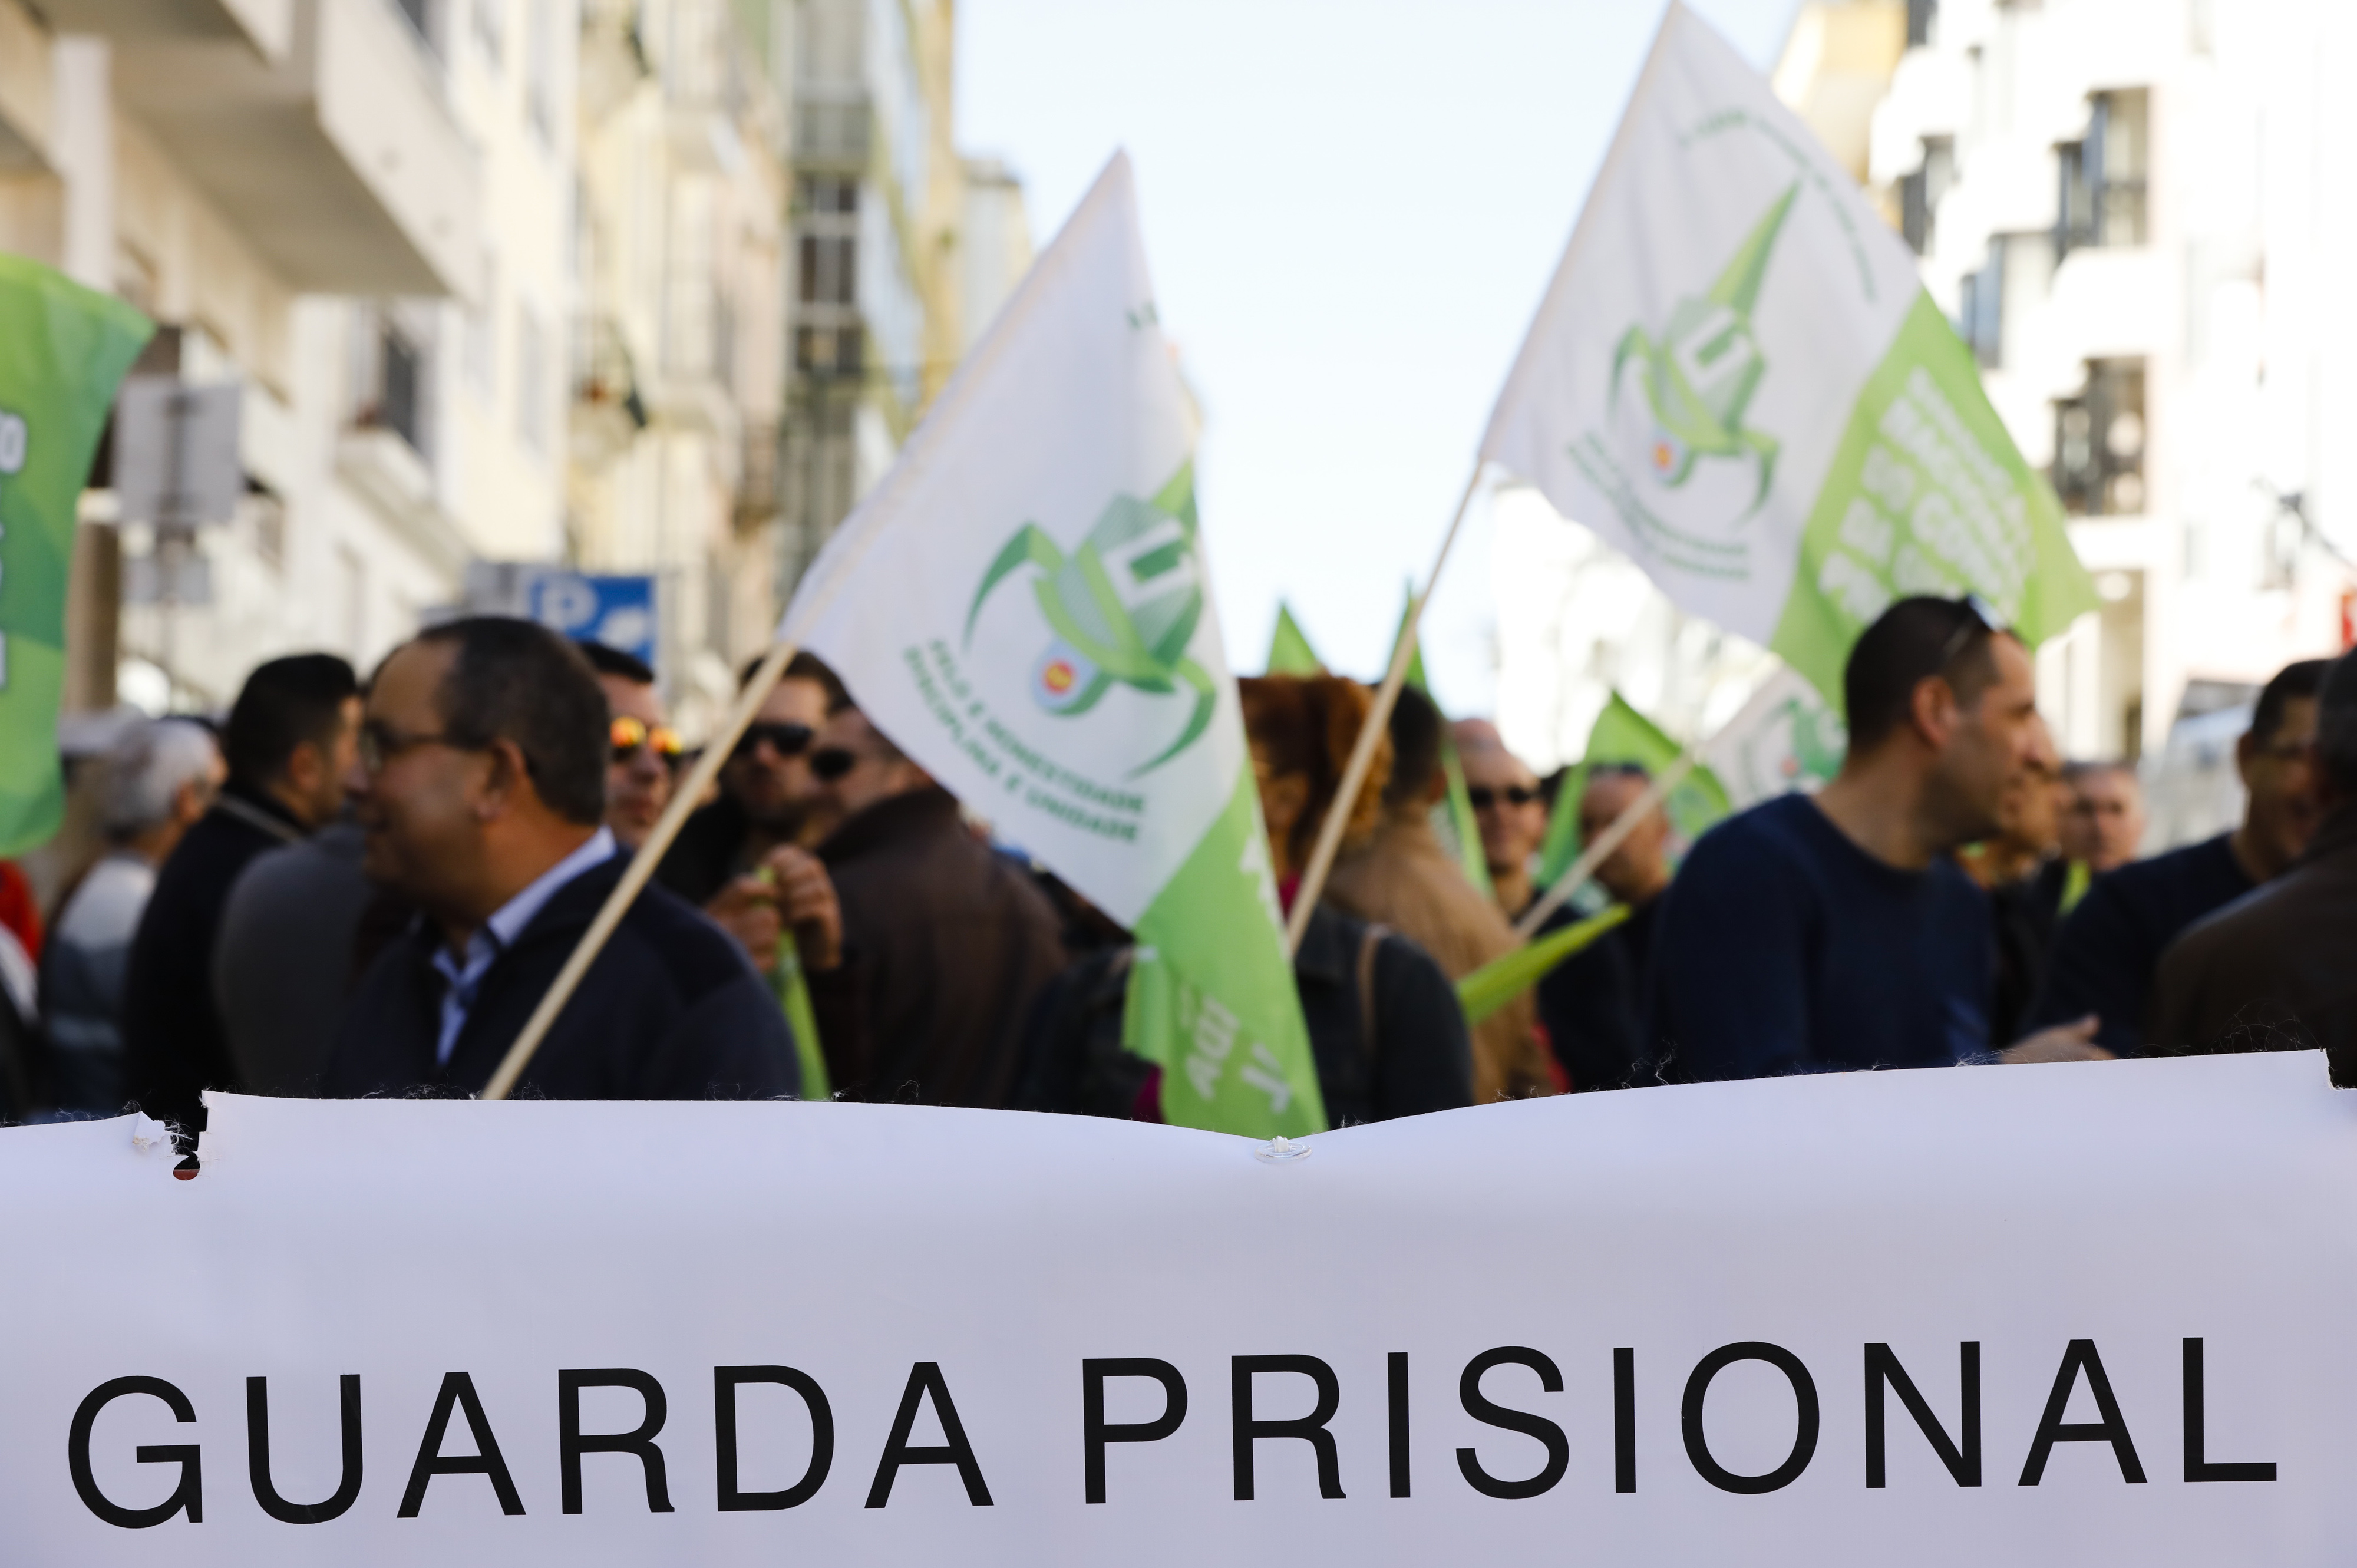 Advogado formaliza queixa na PGR contra greve da Guarda Prisional